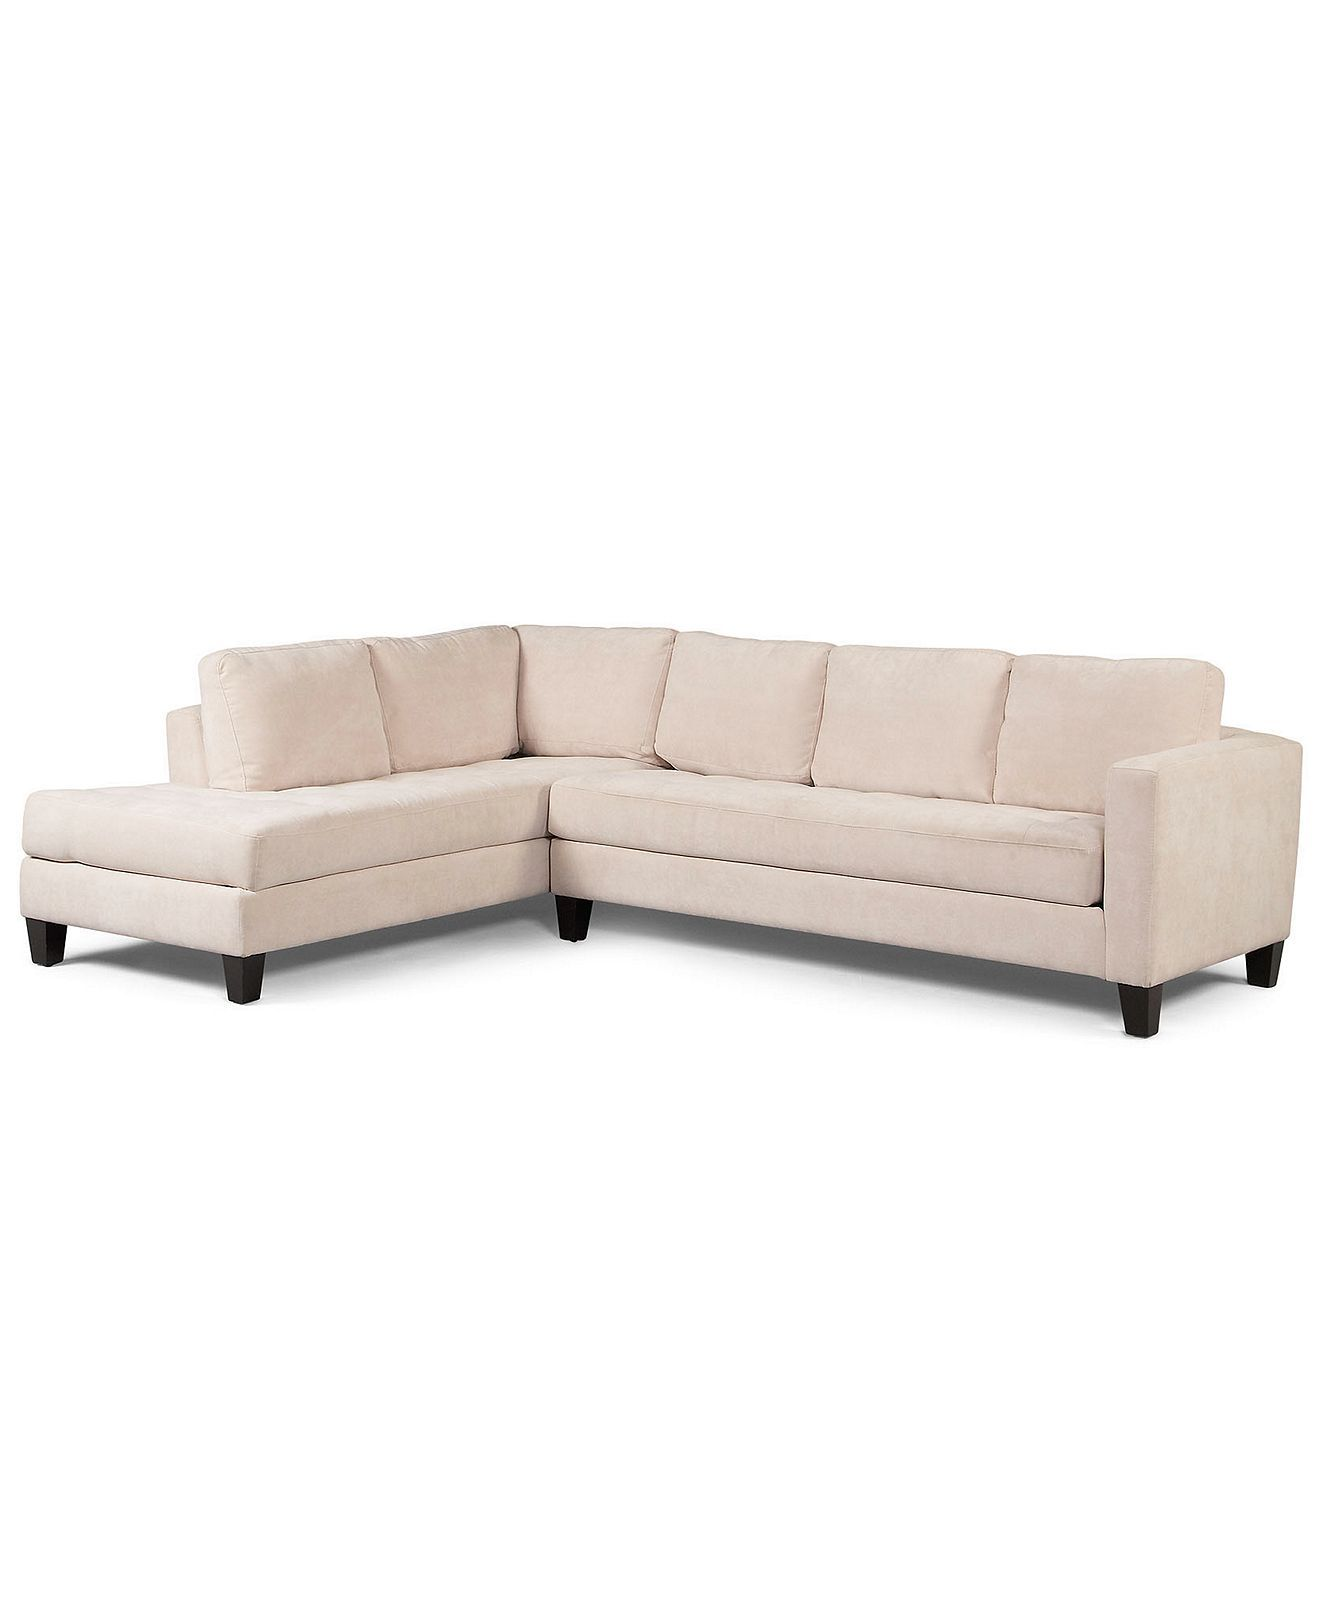 macys sectional sofa microfiber queen size sleeper dimensions milo fabric 2 piece